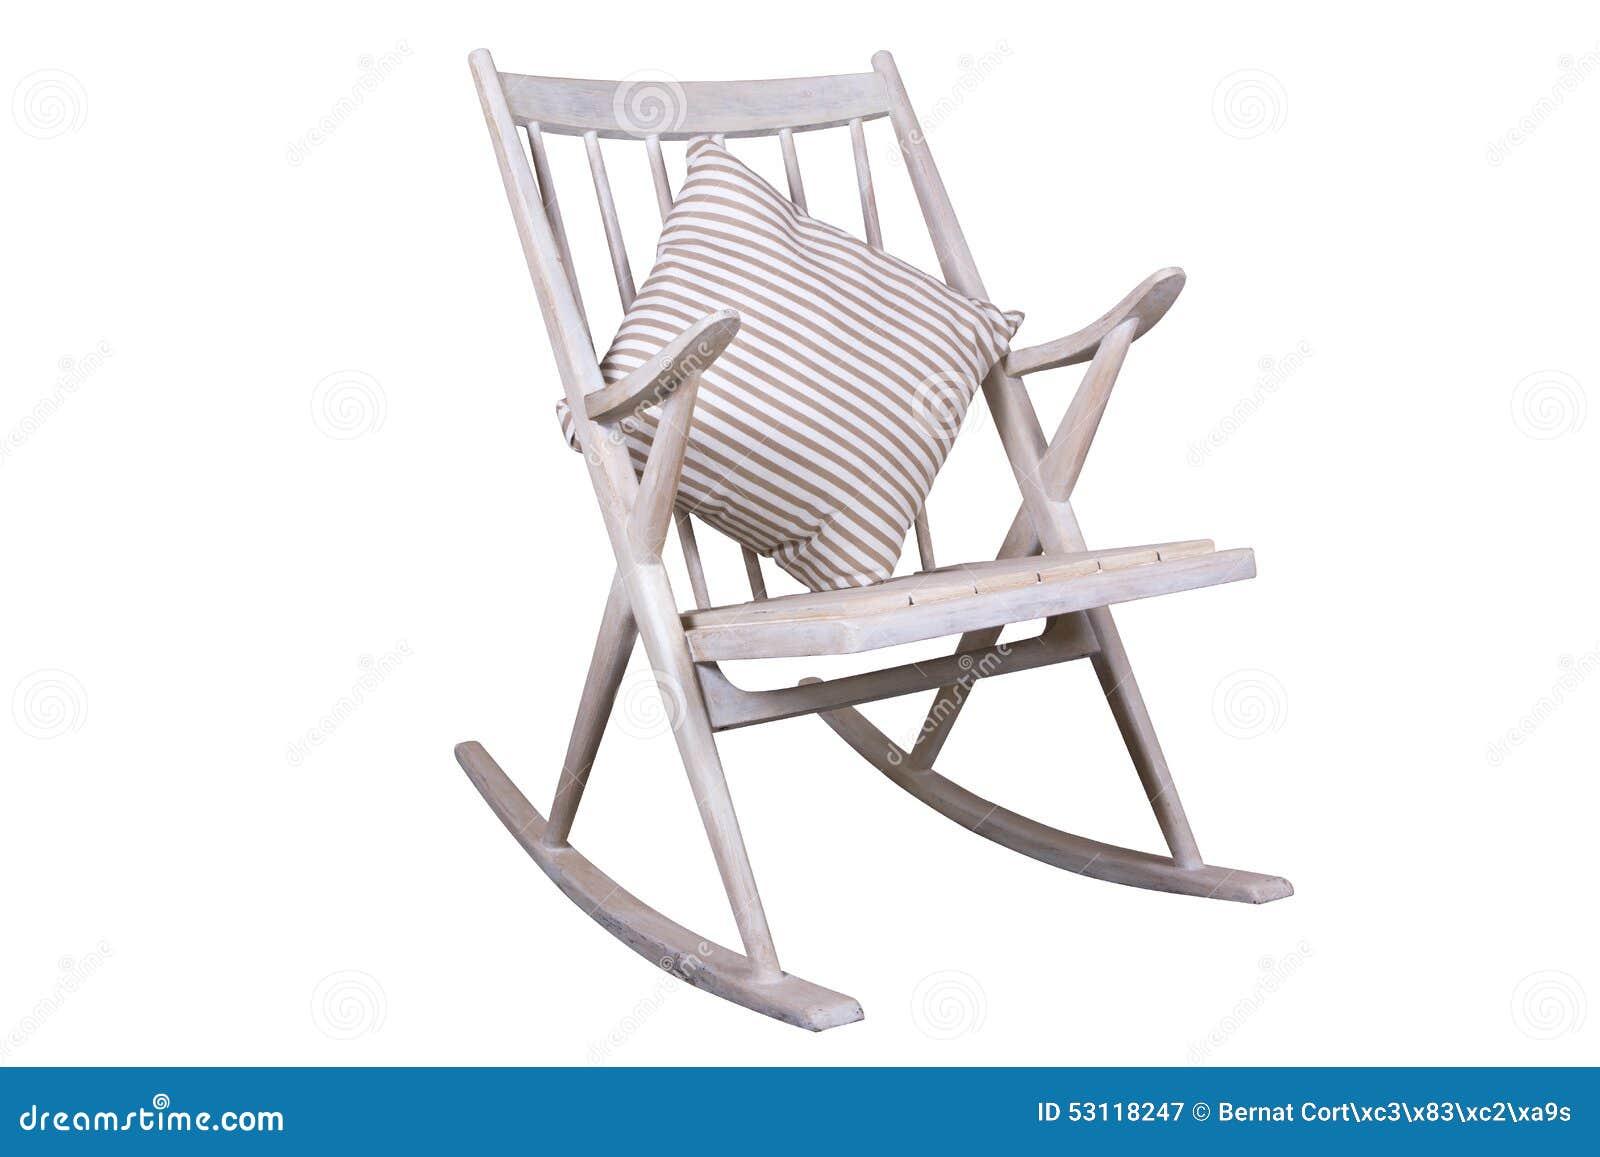 Rocking Chair Stock Photo - Image: 53118247